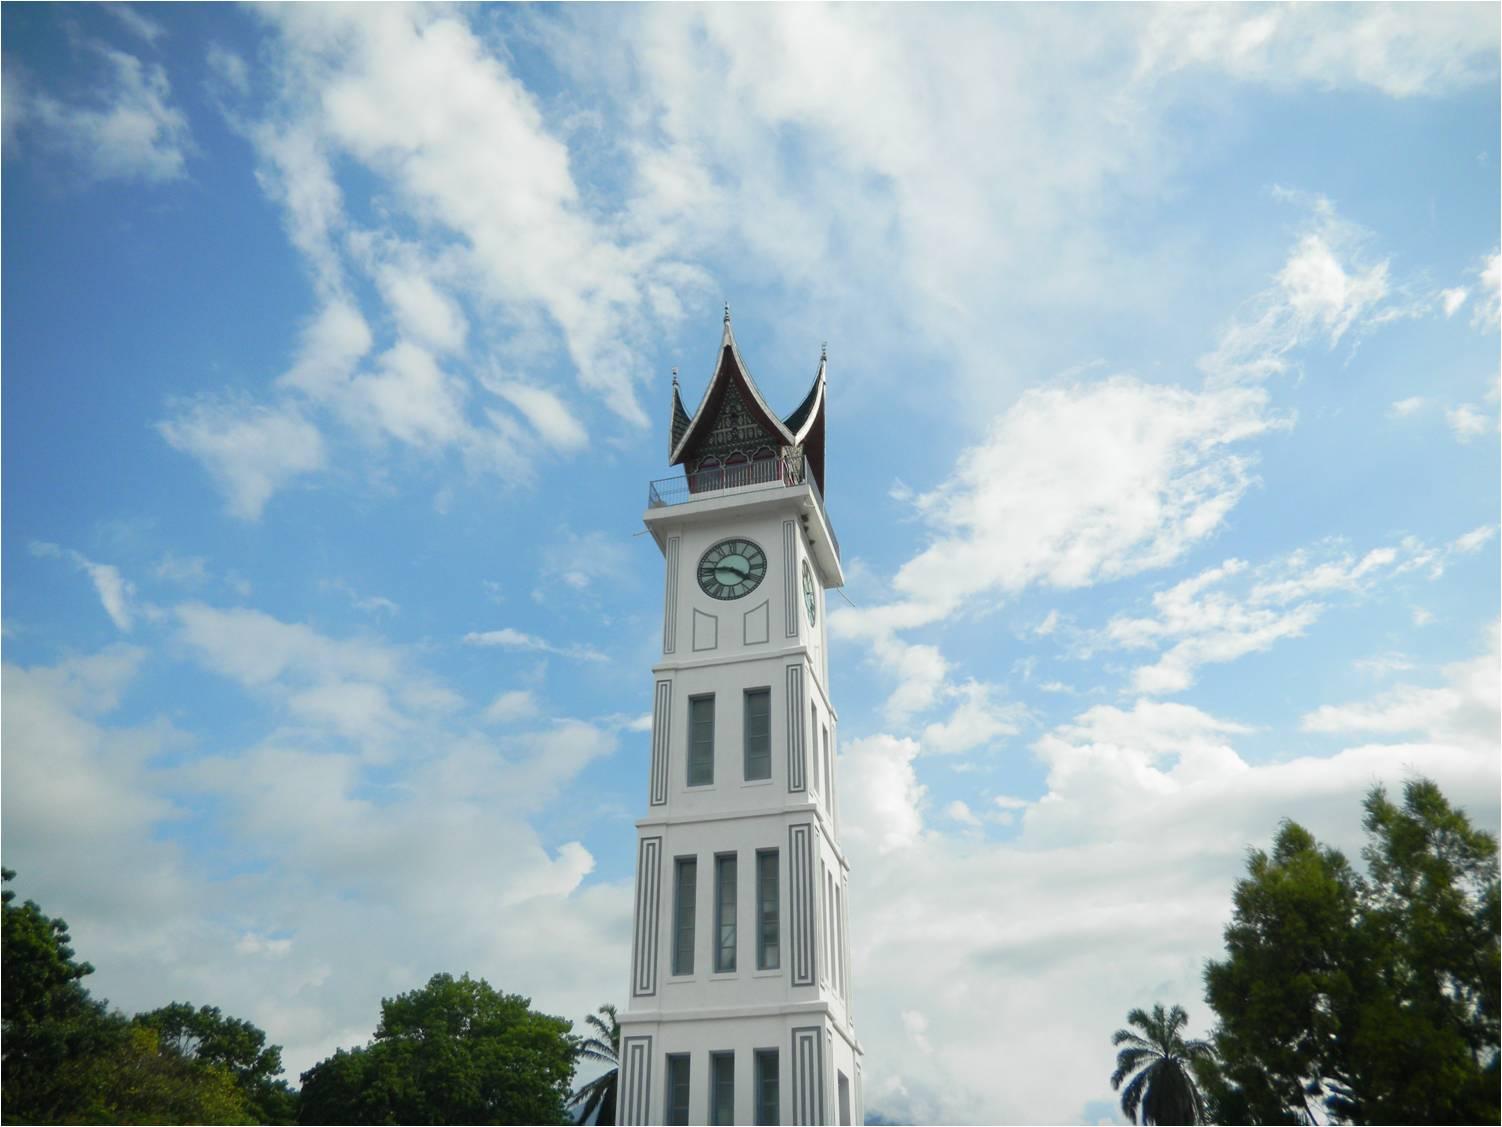 Download this Rumah Gadang Pdikm Padang Panjang picture